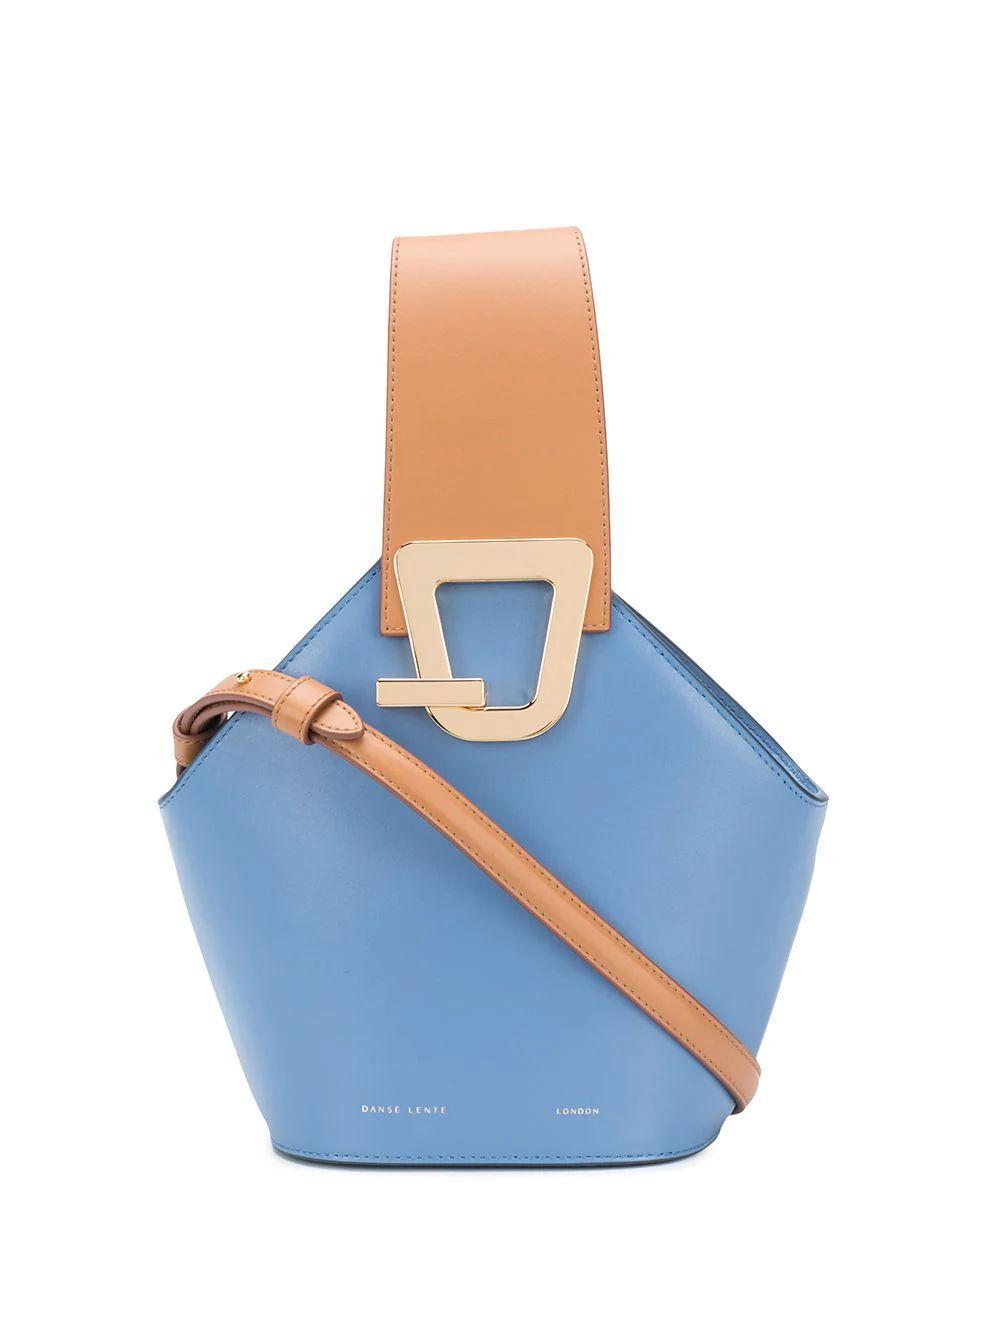 Mini Johnny Bucket Bag Item # F20-08-2544